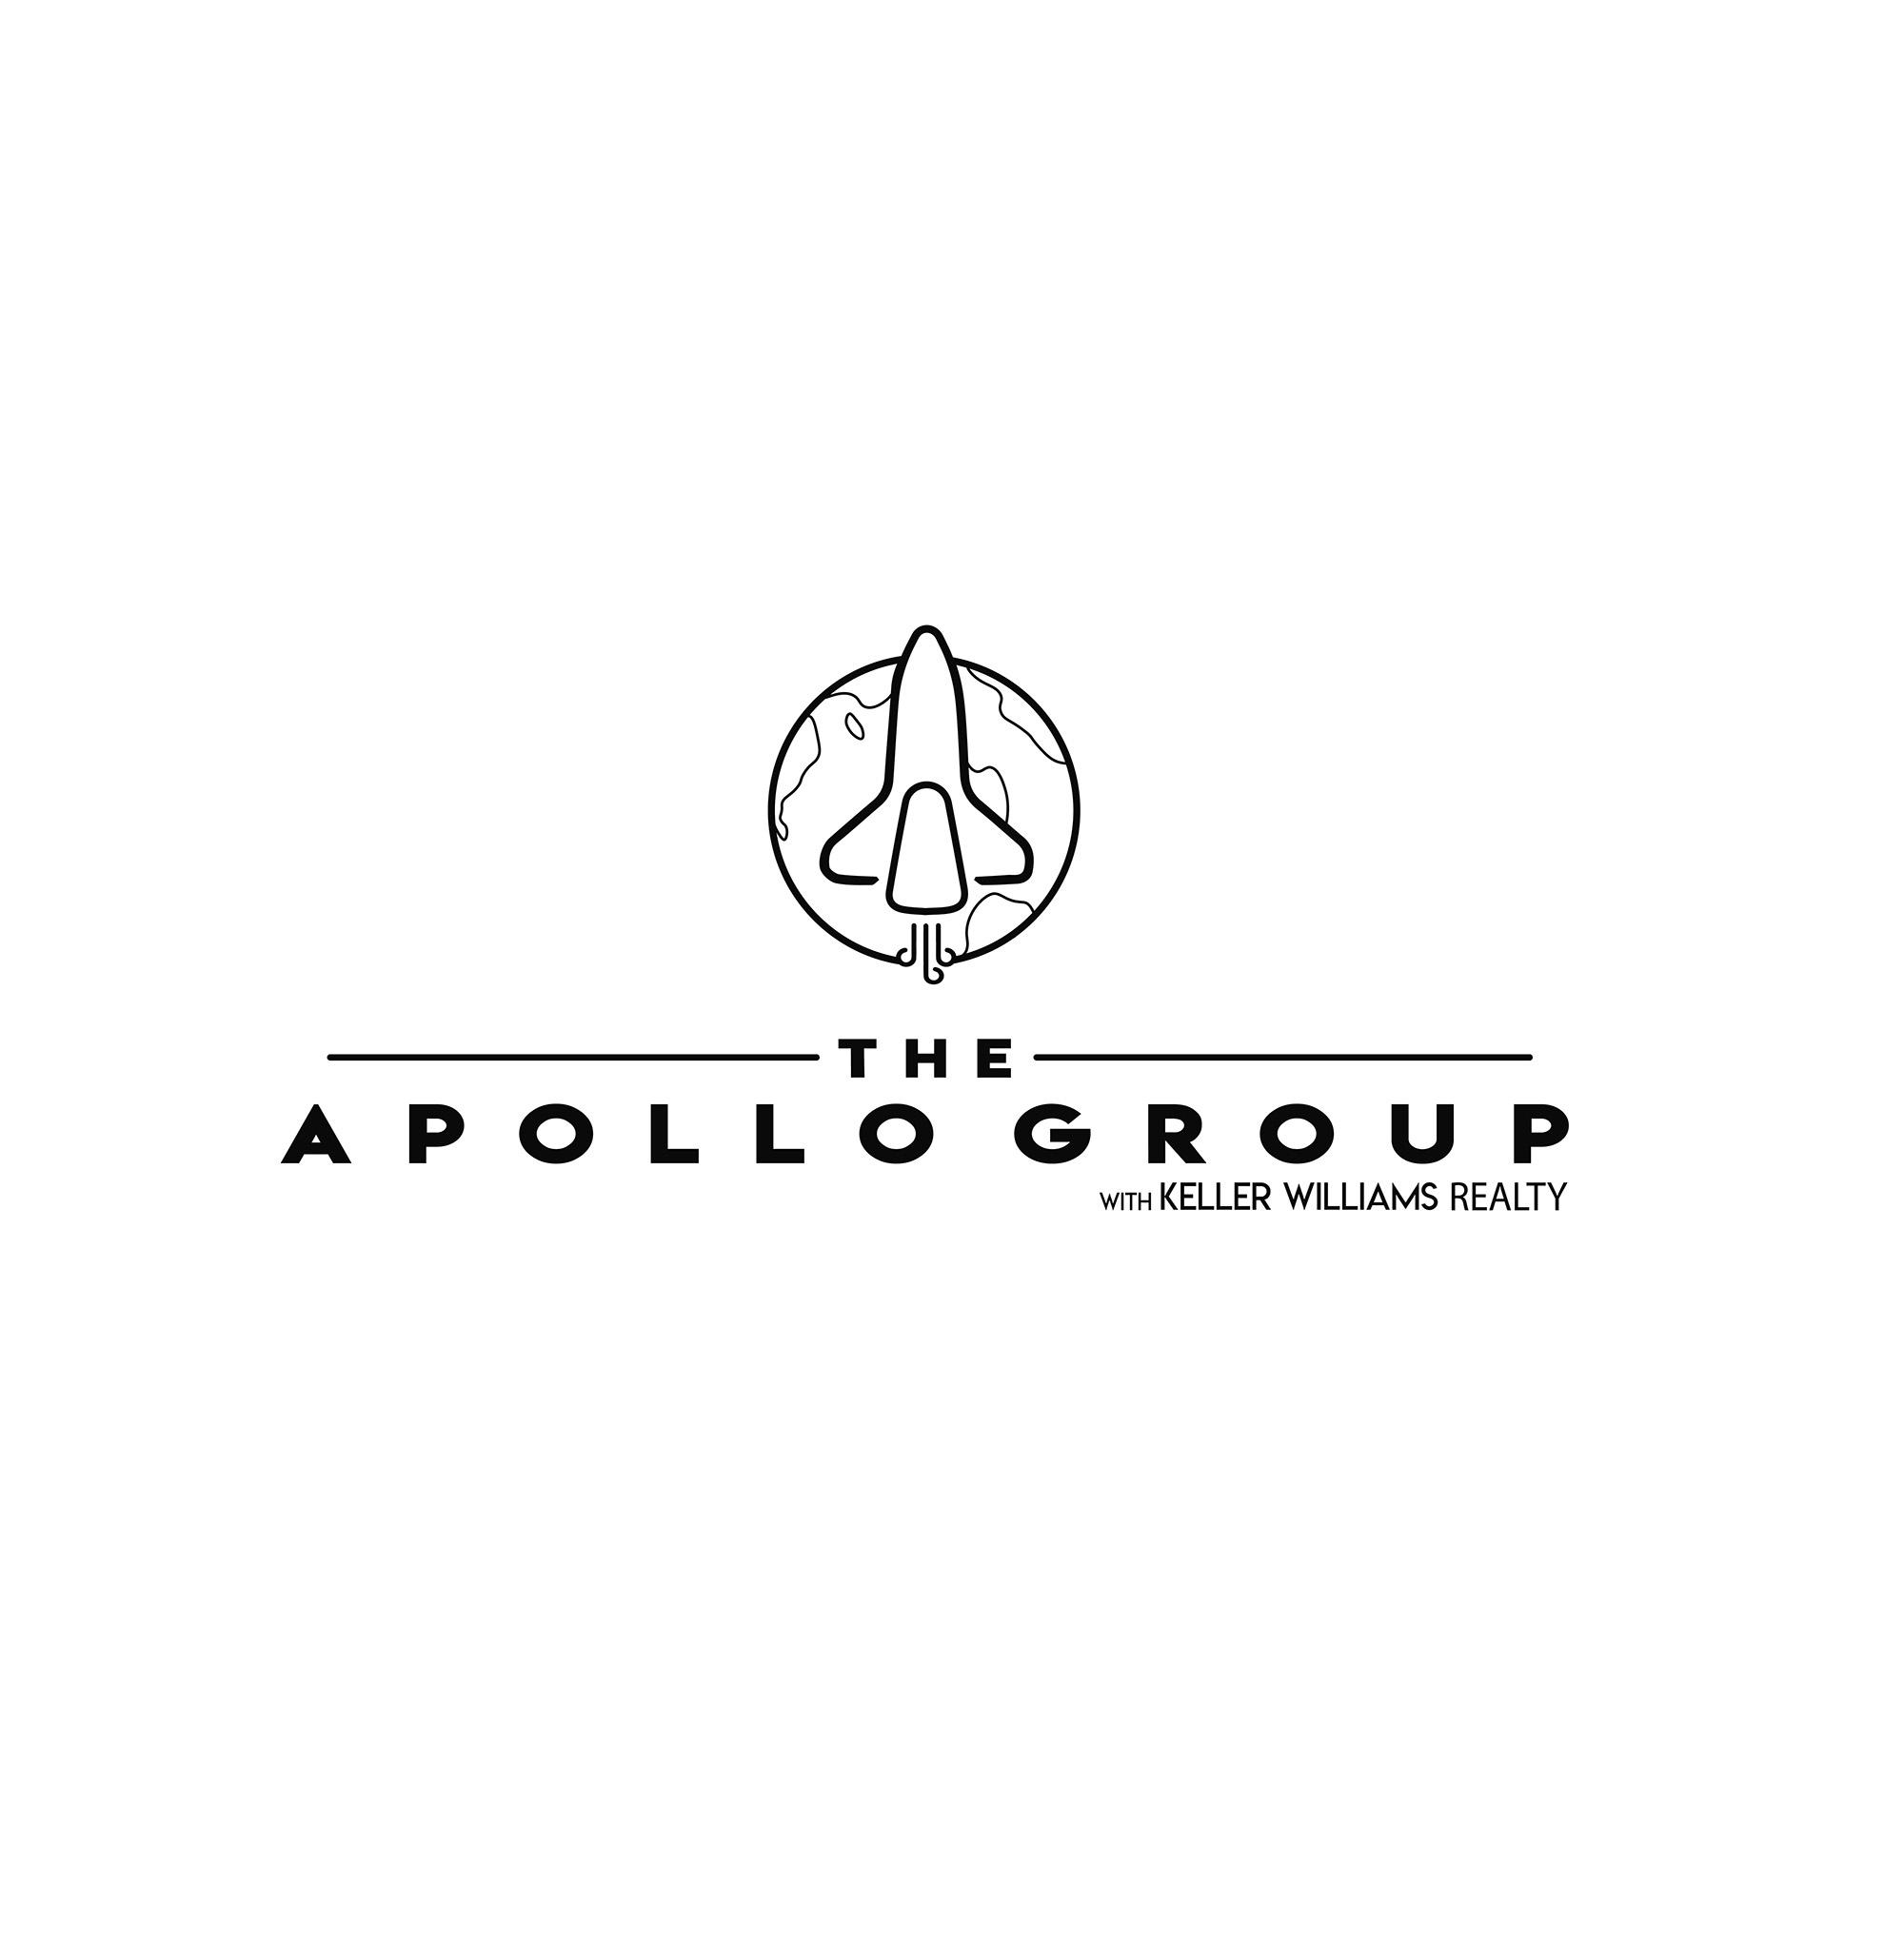 apollo-group-real-estate-Pat-Obrien